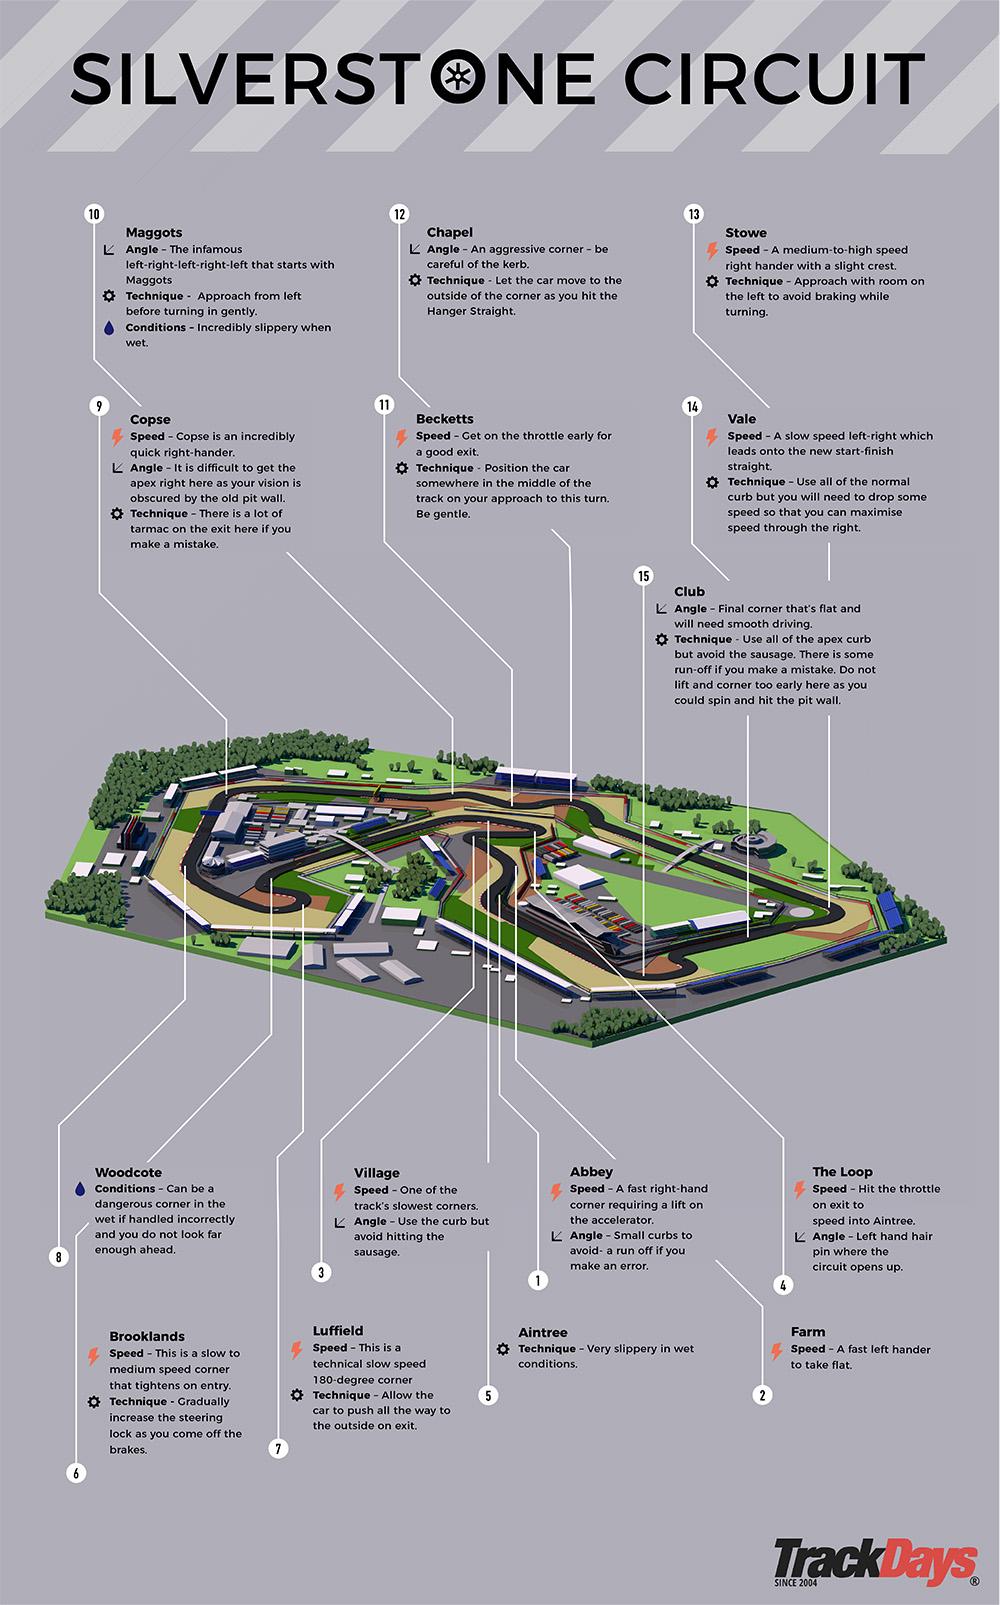 3d-silverstone-race-track-analysis